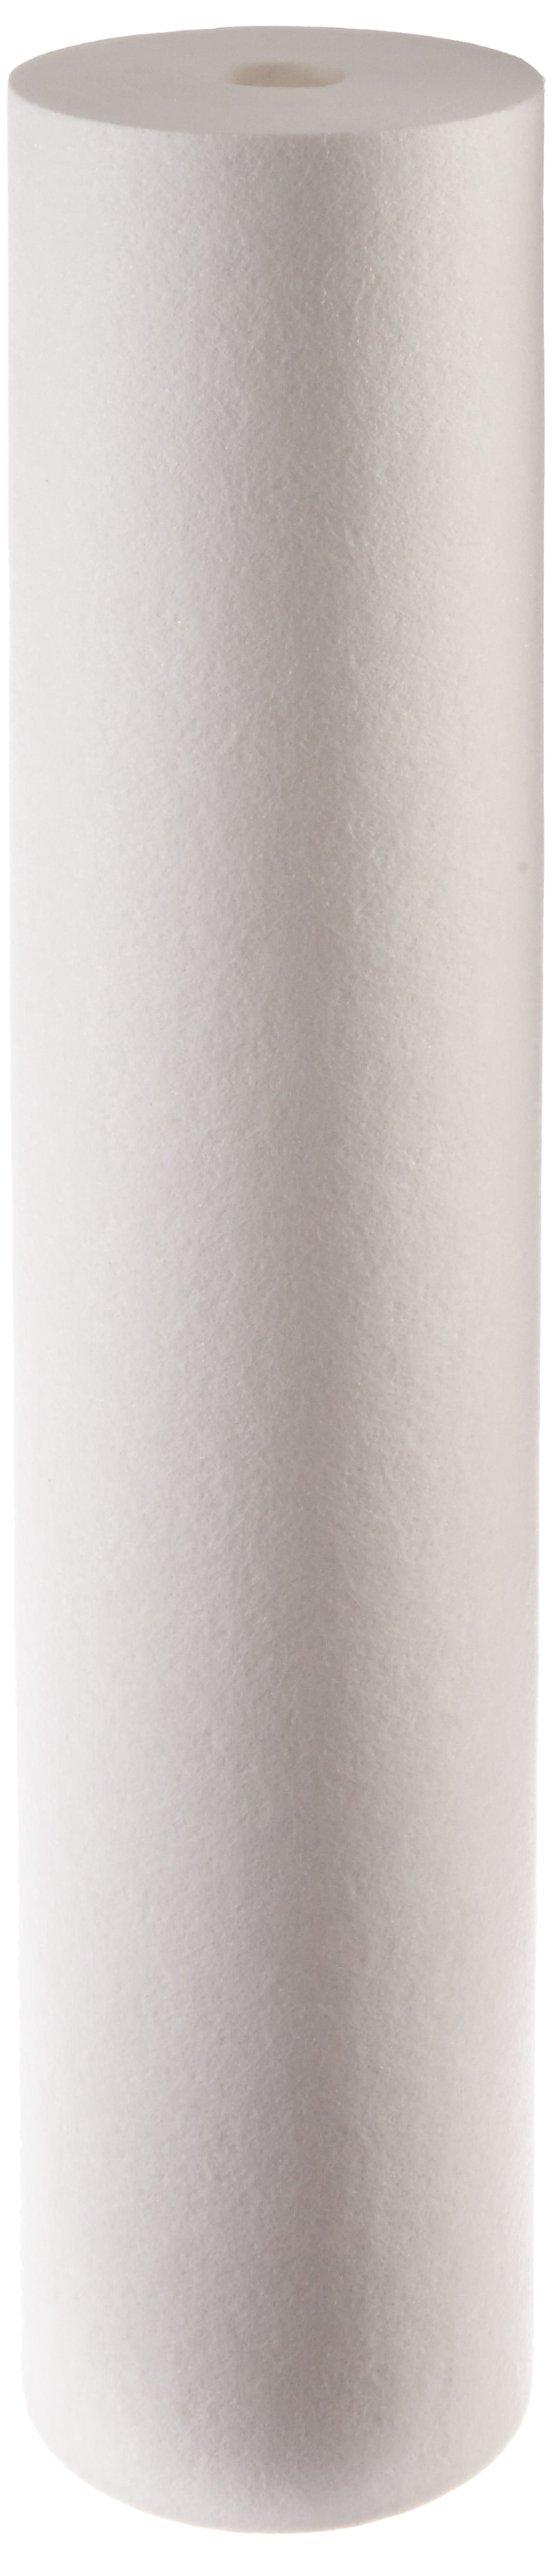 Pentek DGD-2501-20 Spun Polypropylene Filter Cartridge, 20'' x 4-1/2'' by Pentek